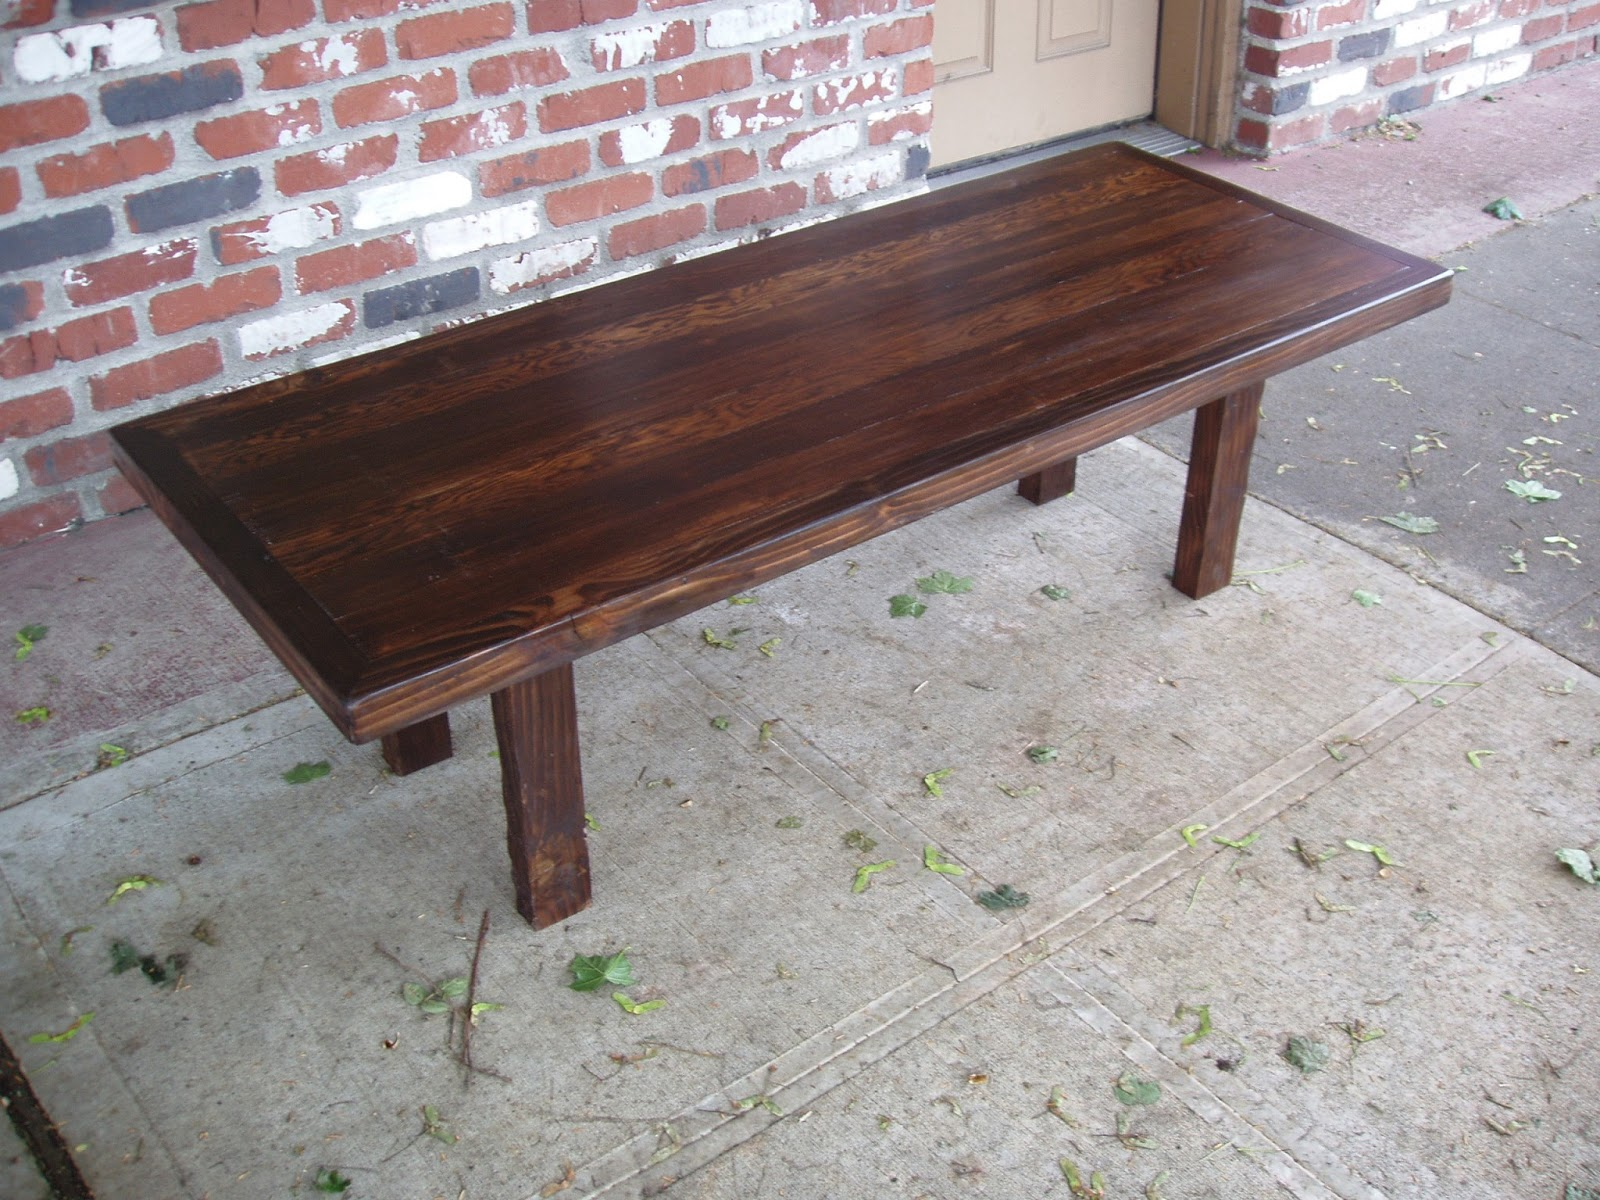 driftedge woodworking Reclaimed Doug Fir and Spruce Coffee Table